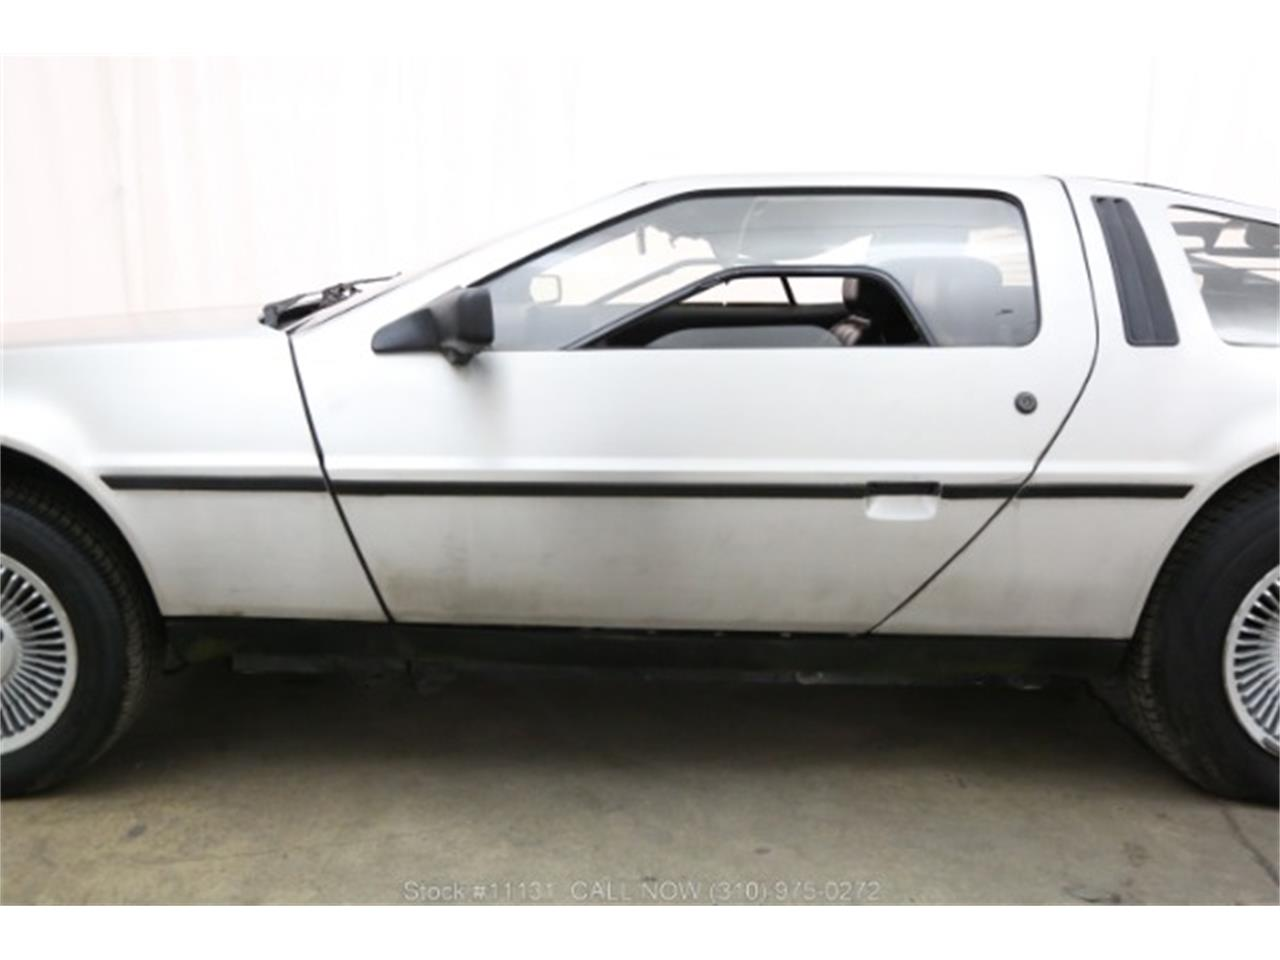 Large Picture of 1981 DMC-12 - $19,500.00 - QNPP